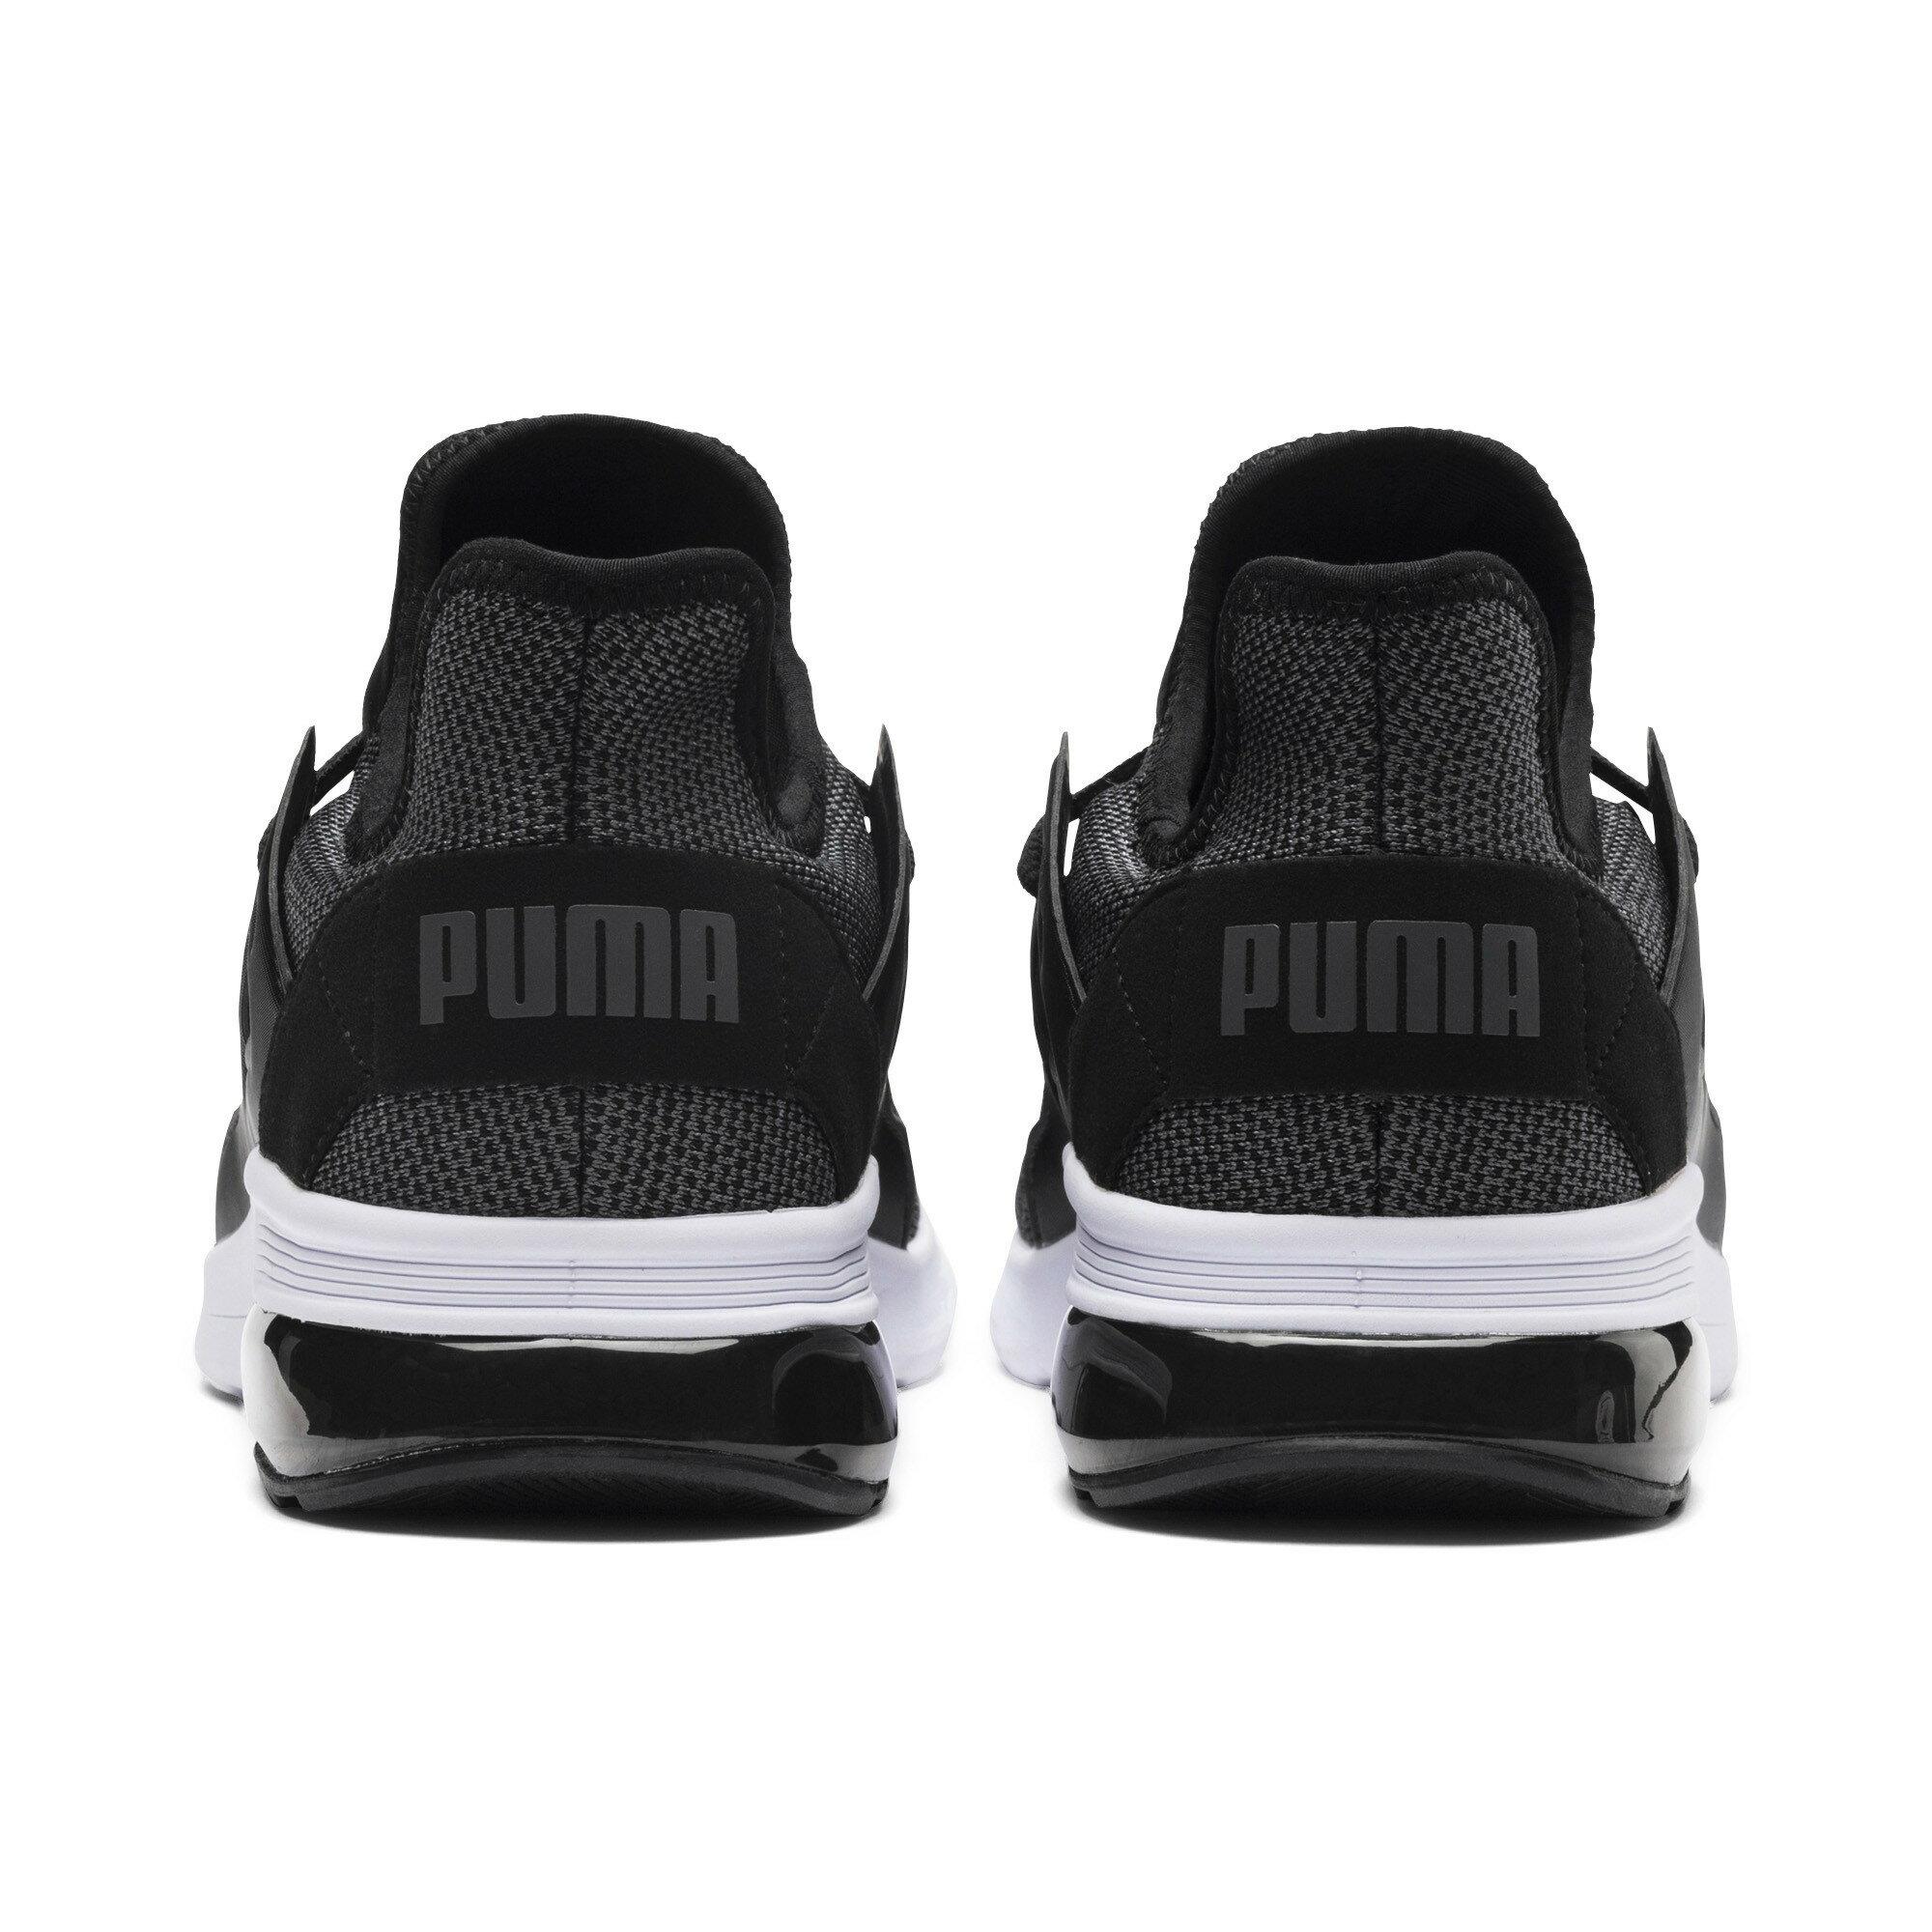 3a97a5c9d33f Official Puma Store  PUMA Electron Street Knit Sneakers Men Shoe ...